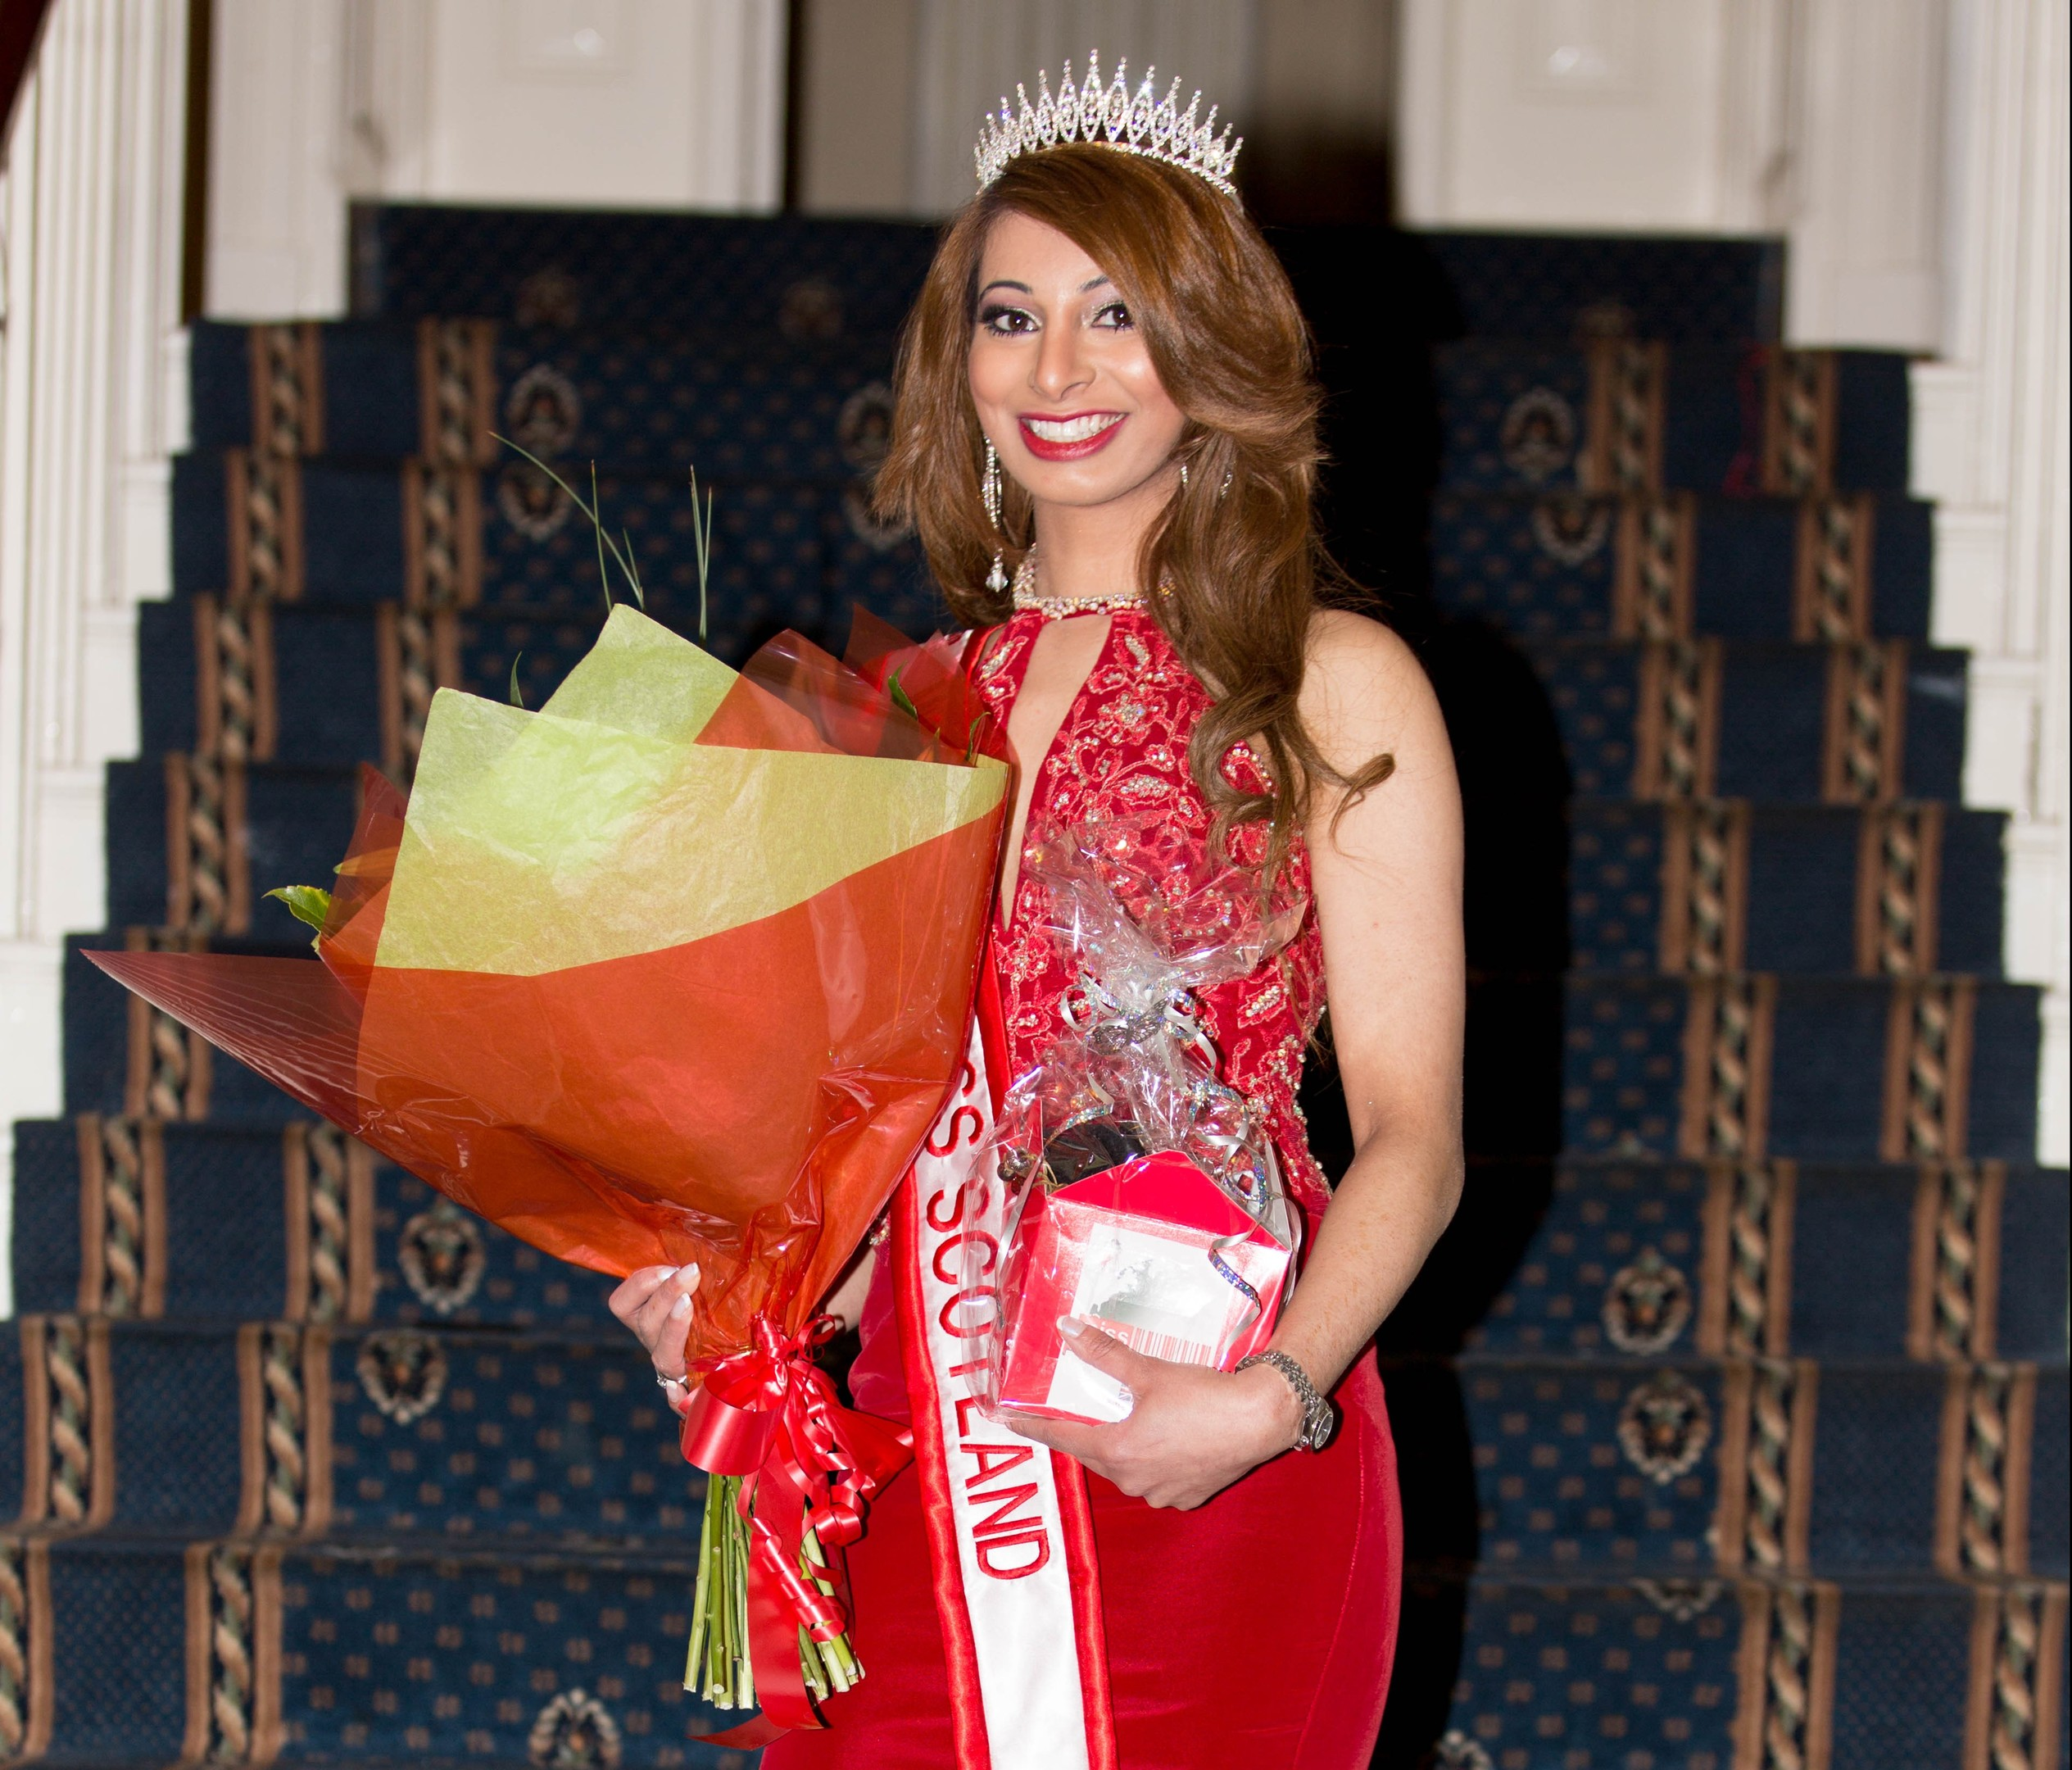 Madiha Iqbal posing triumphantly after becoming Miss Progress Scotland